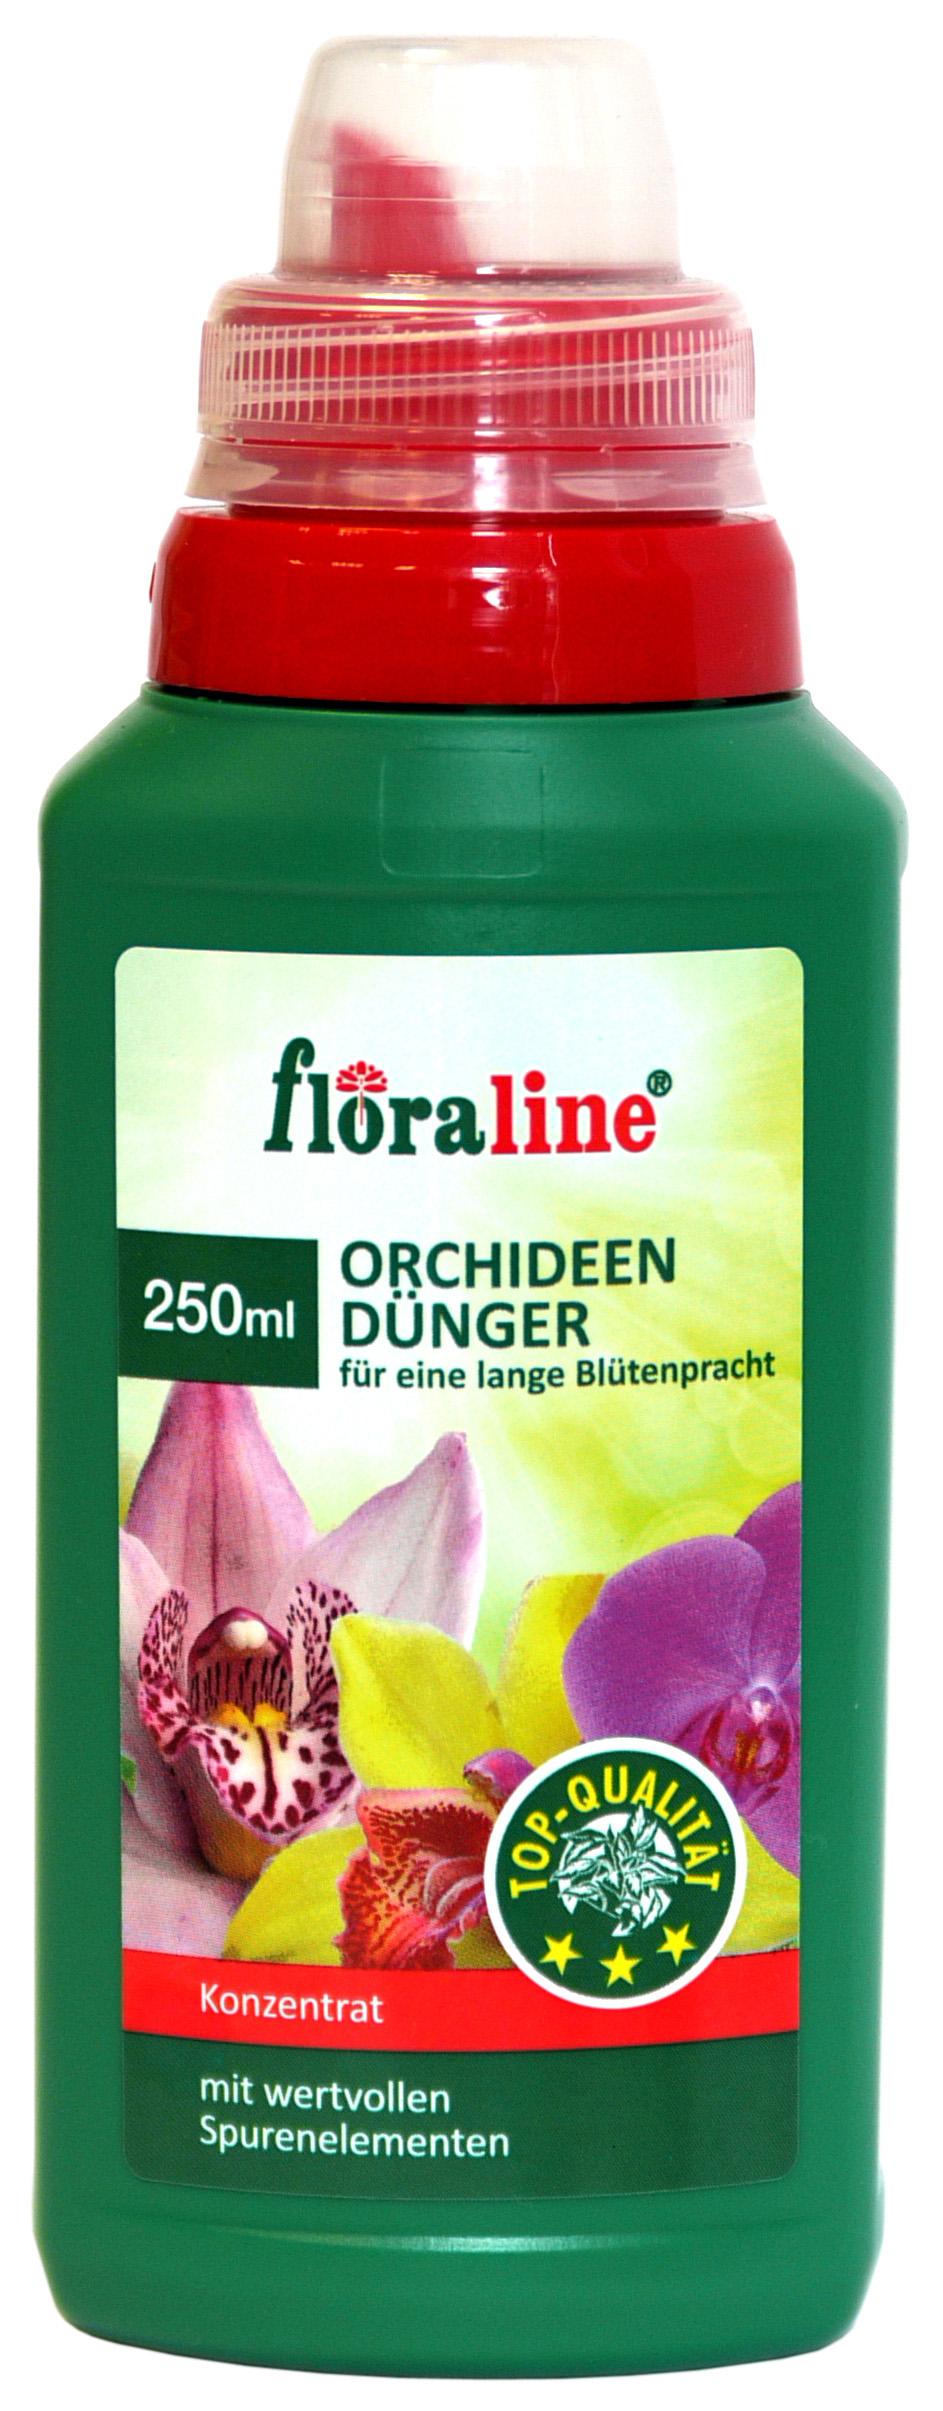 02205 - floraline Orchideendünger 250 ml